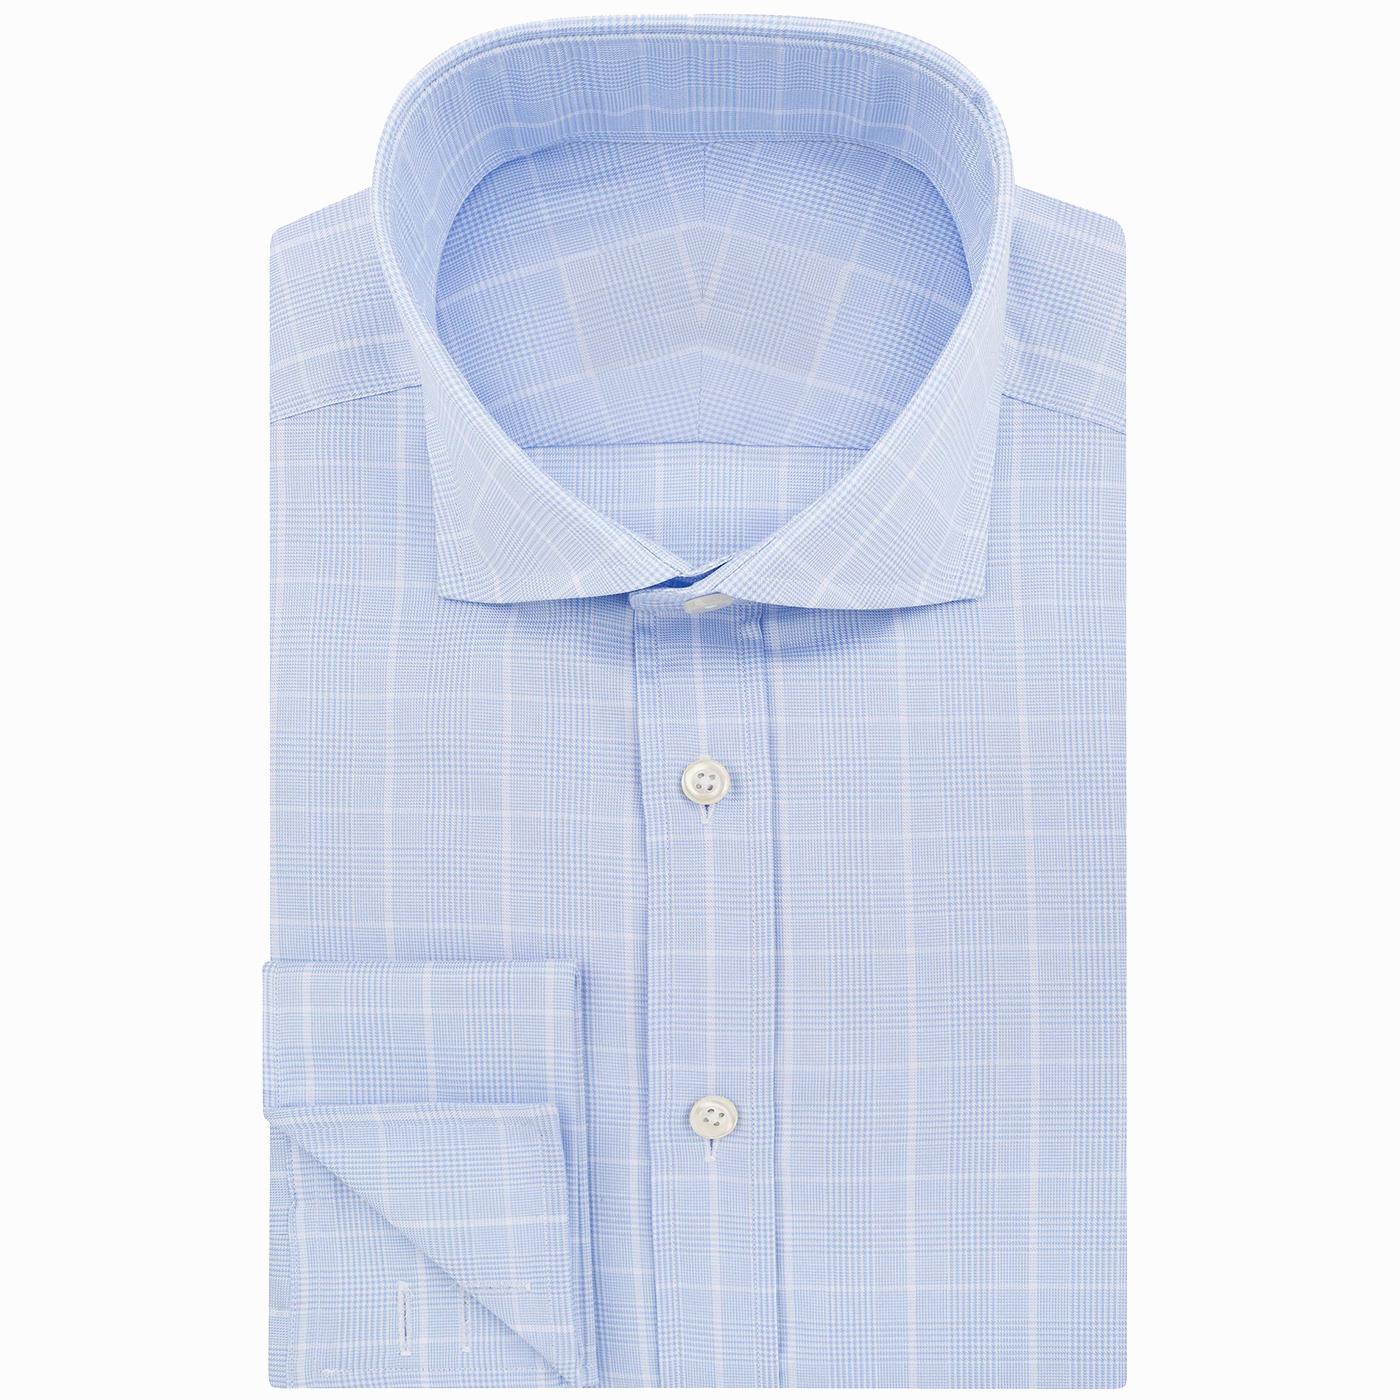 Shirt_17_Prince-of-wales_sky.jpg